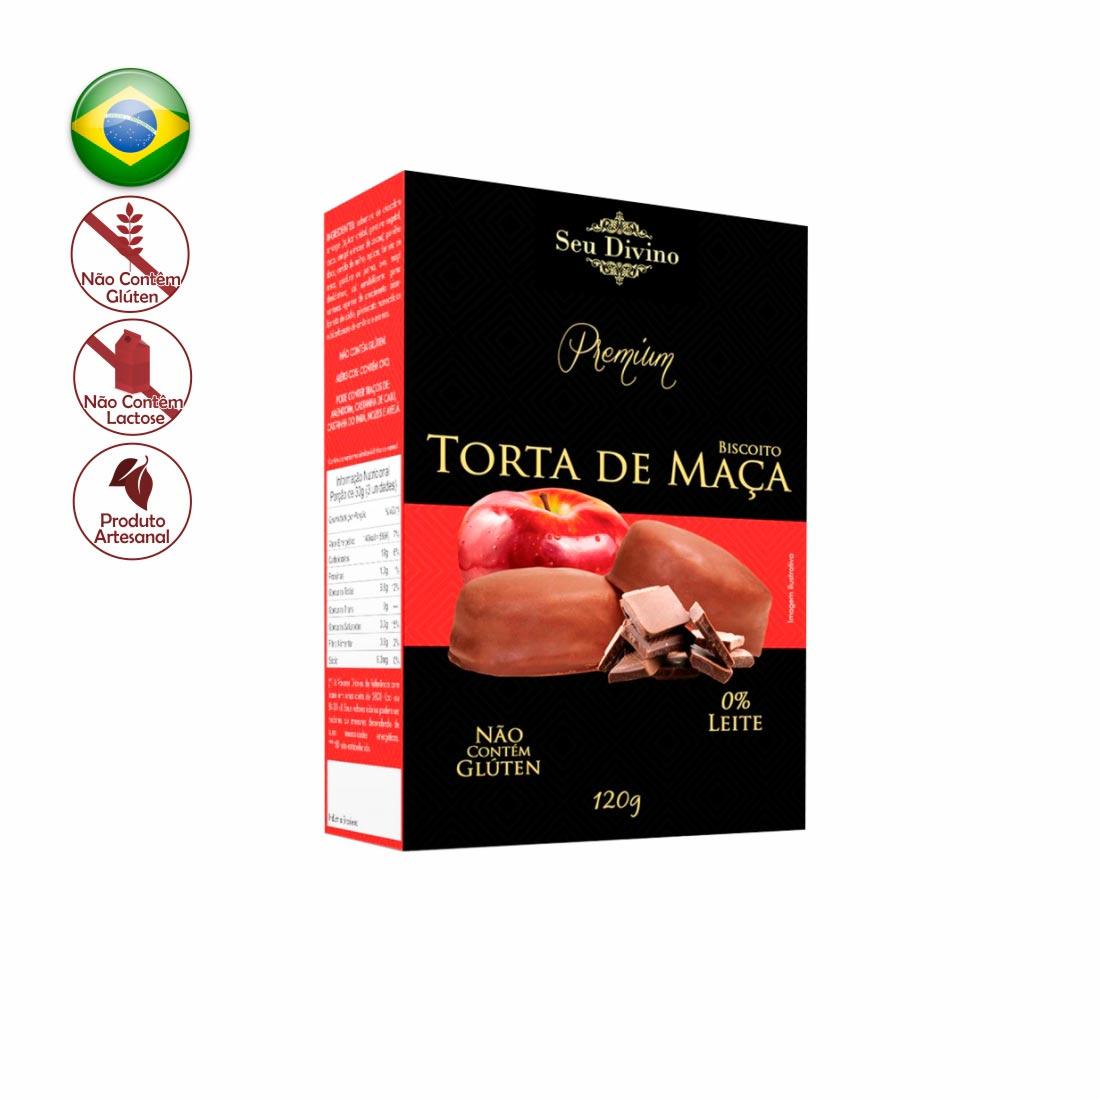 BISCOITO TORTA DE MAÇÃ PREMIUM SEU DIVINO SEM GLÚTEN E ZERO LACTOSE 120G